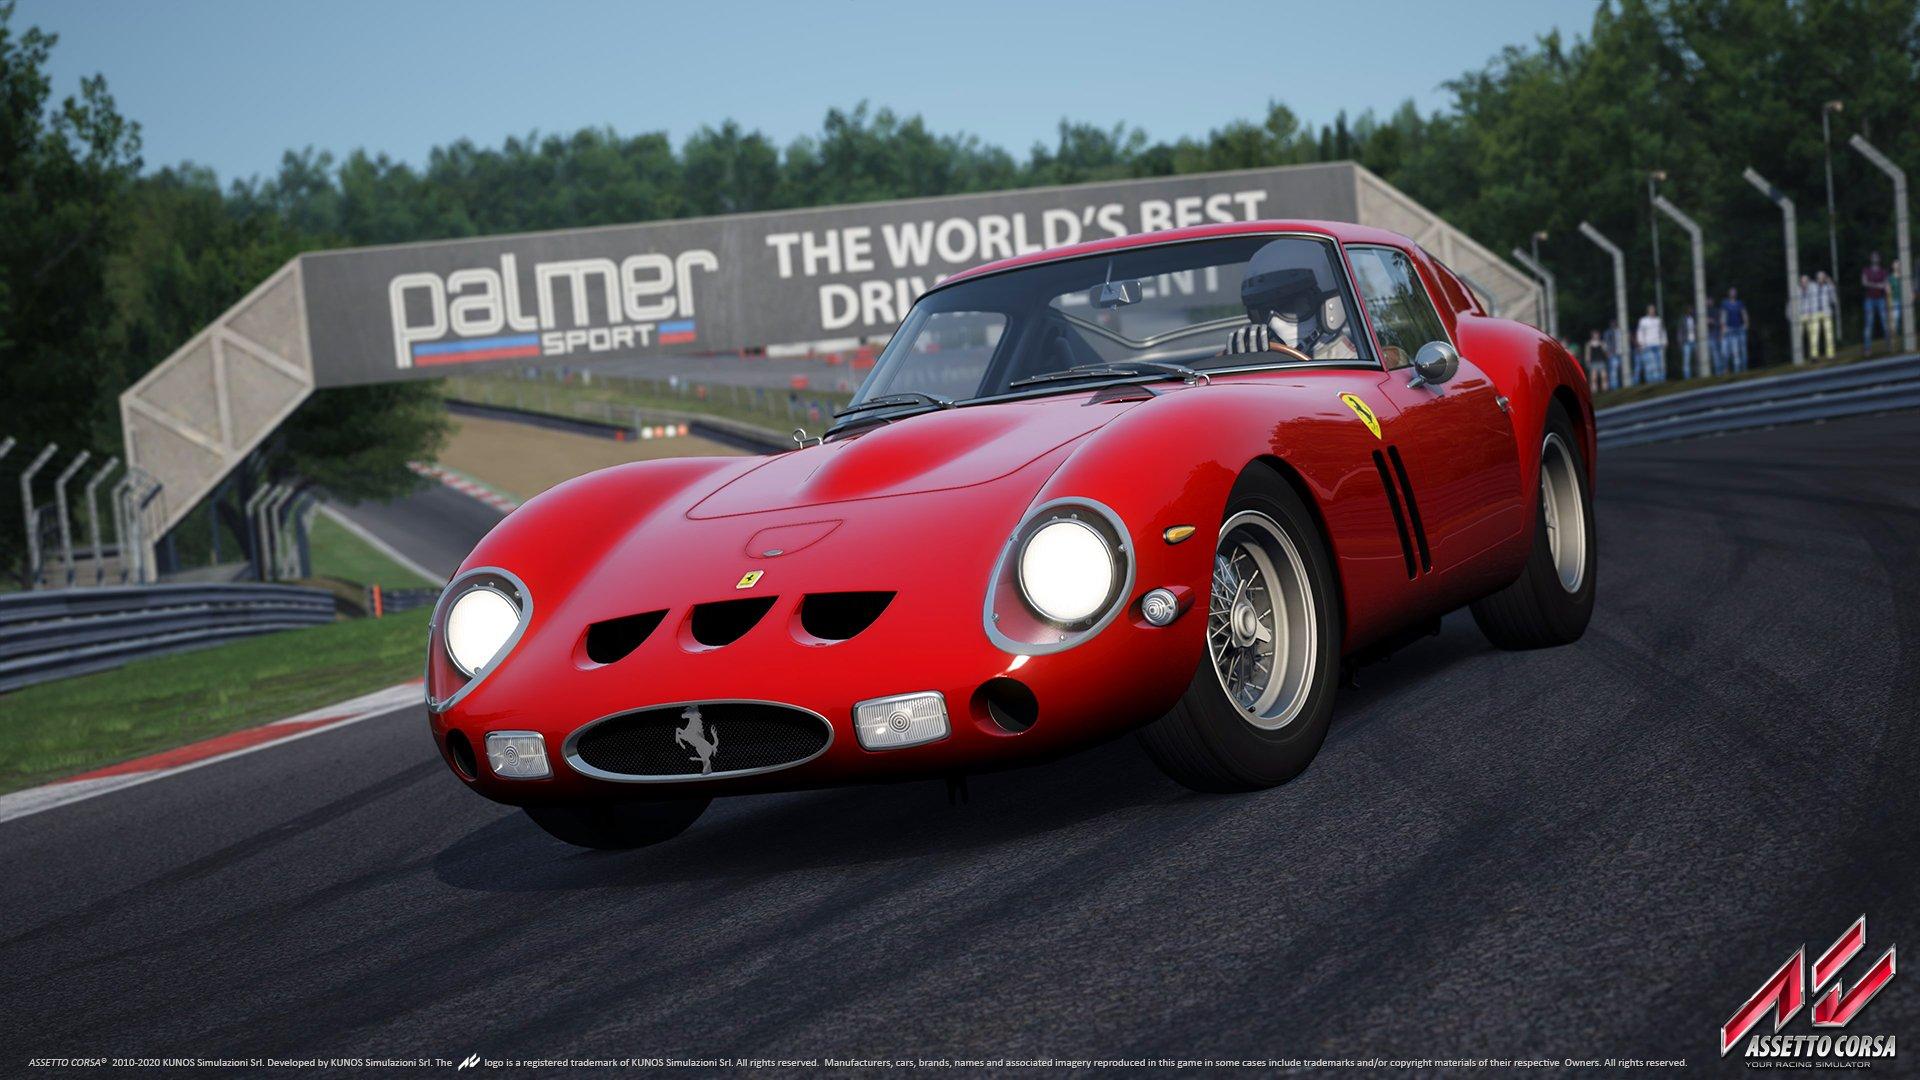 Assetto Corsa Ferrari 70th Anniversary Celebration Pack